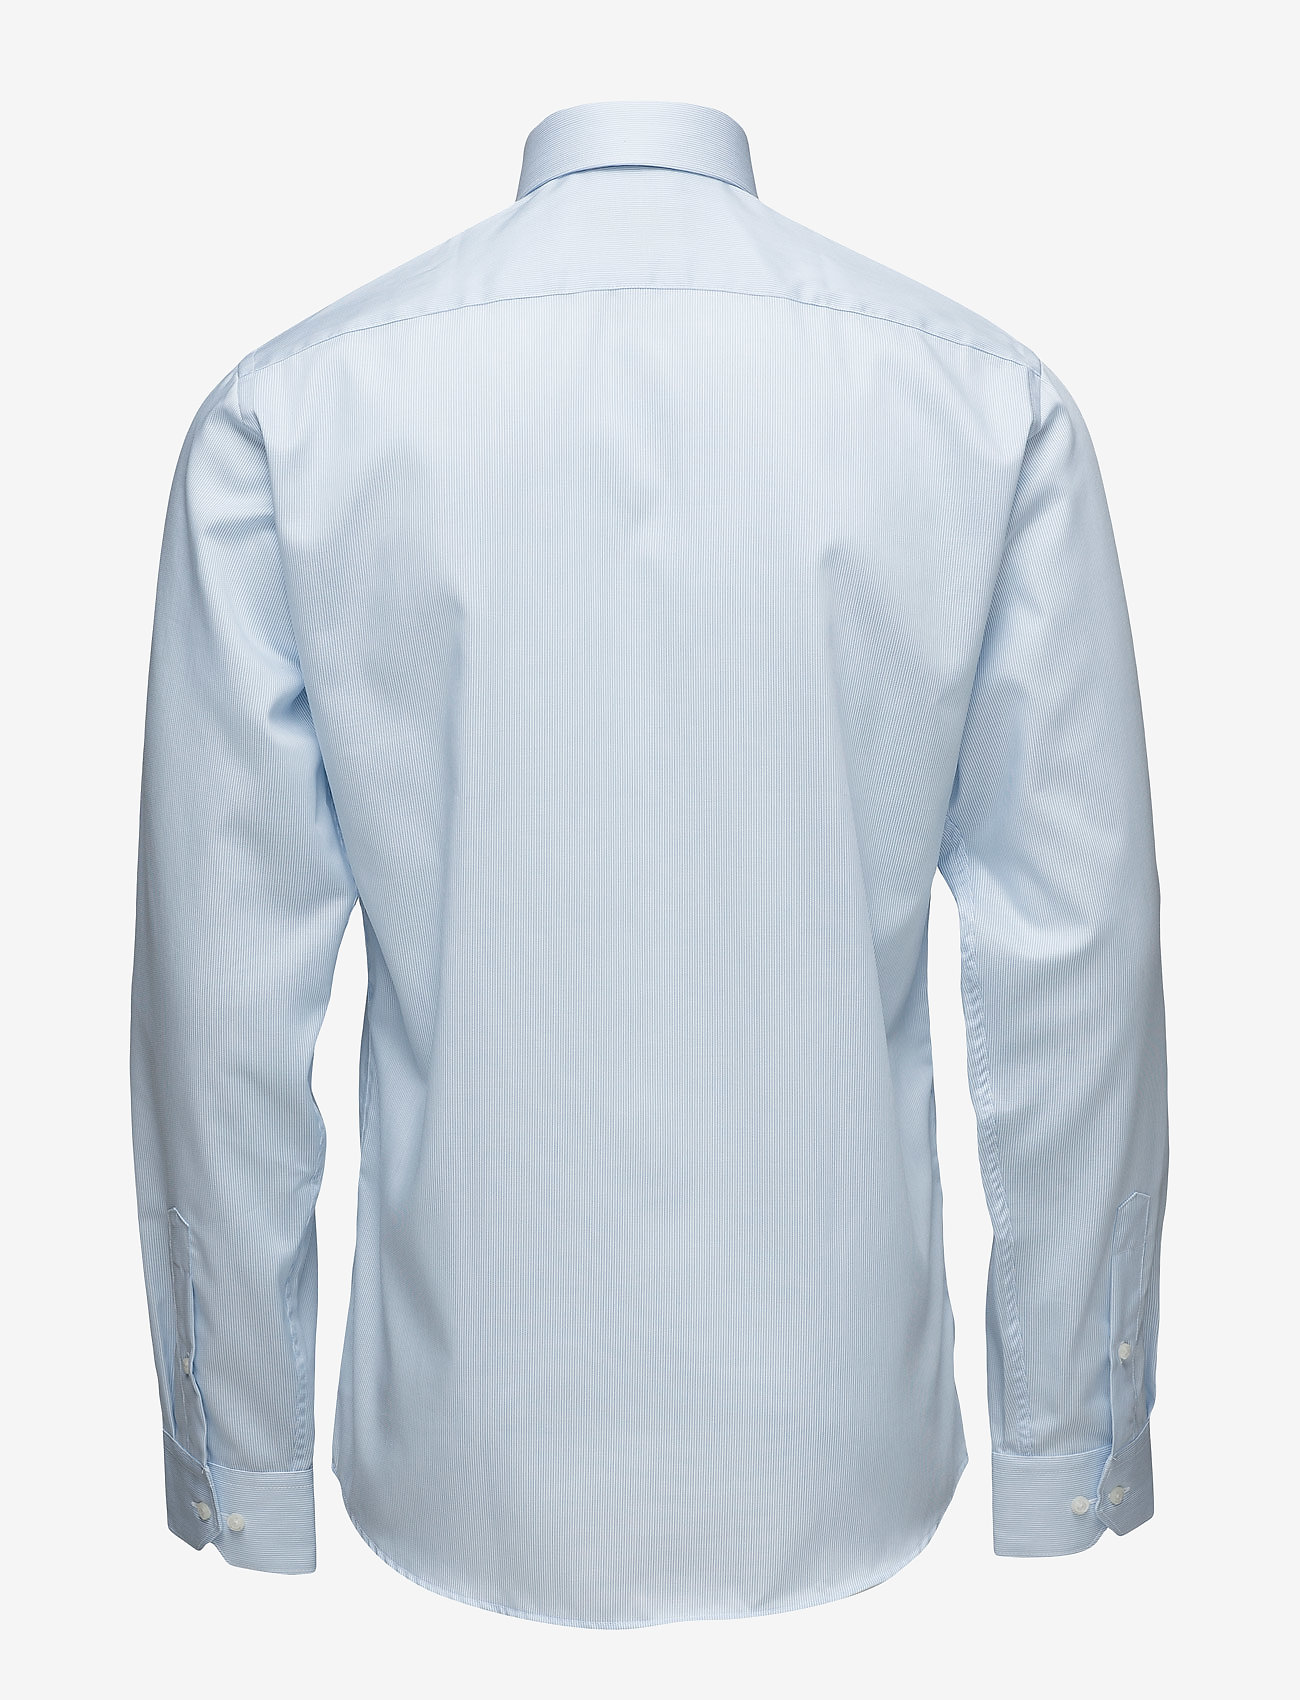 Seven Seas Copenhagen - Fine Twill | California - Slim Fit - basic overhemden - light blue - 1